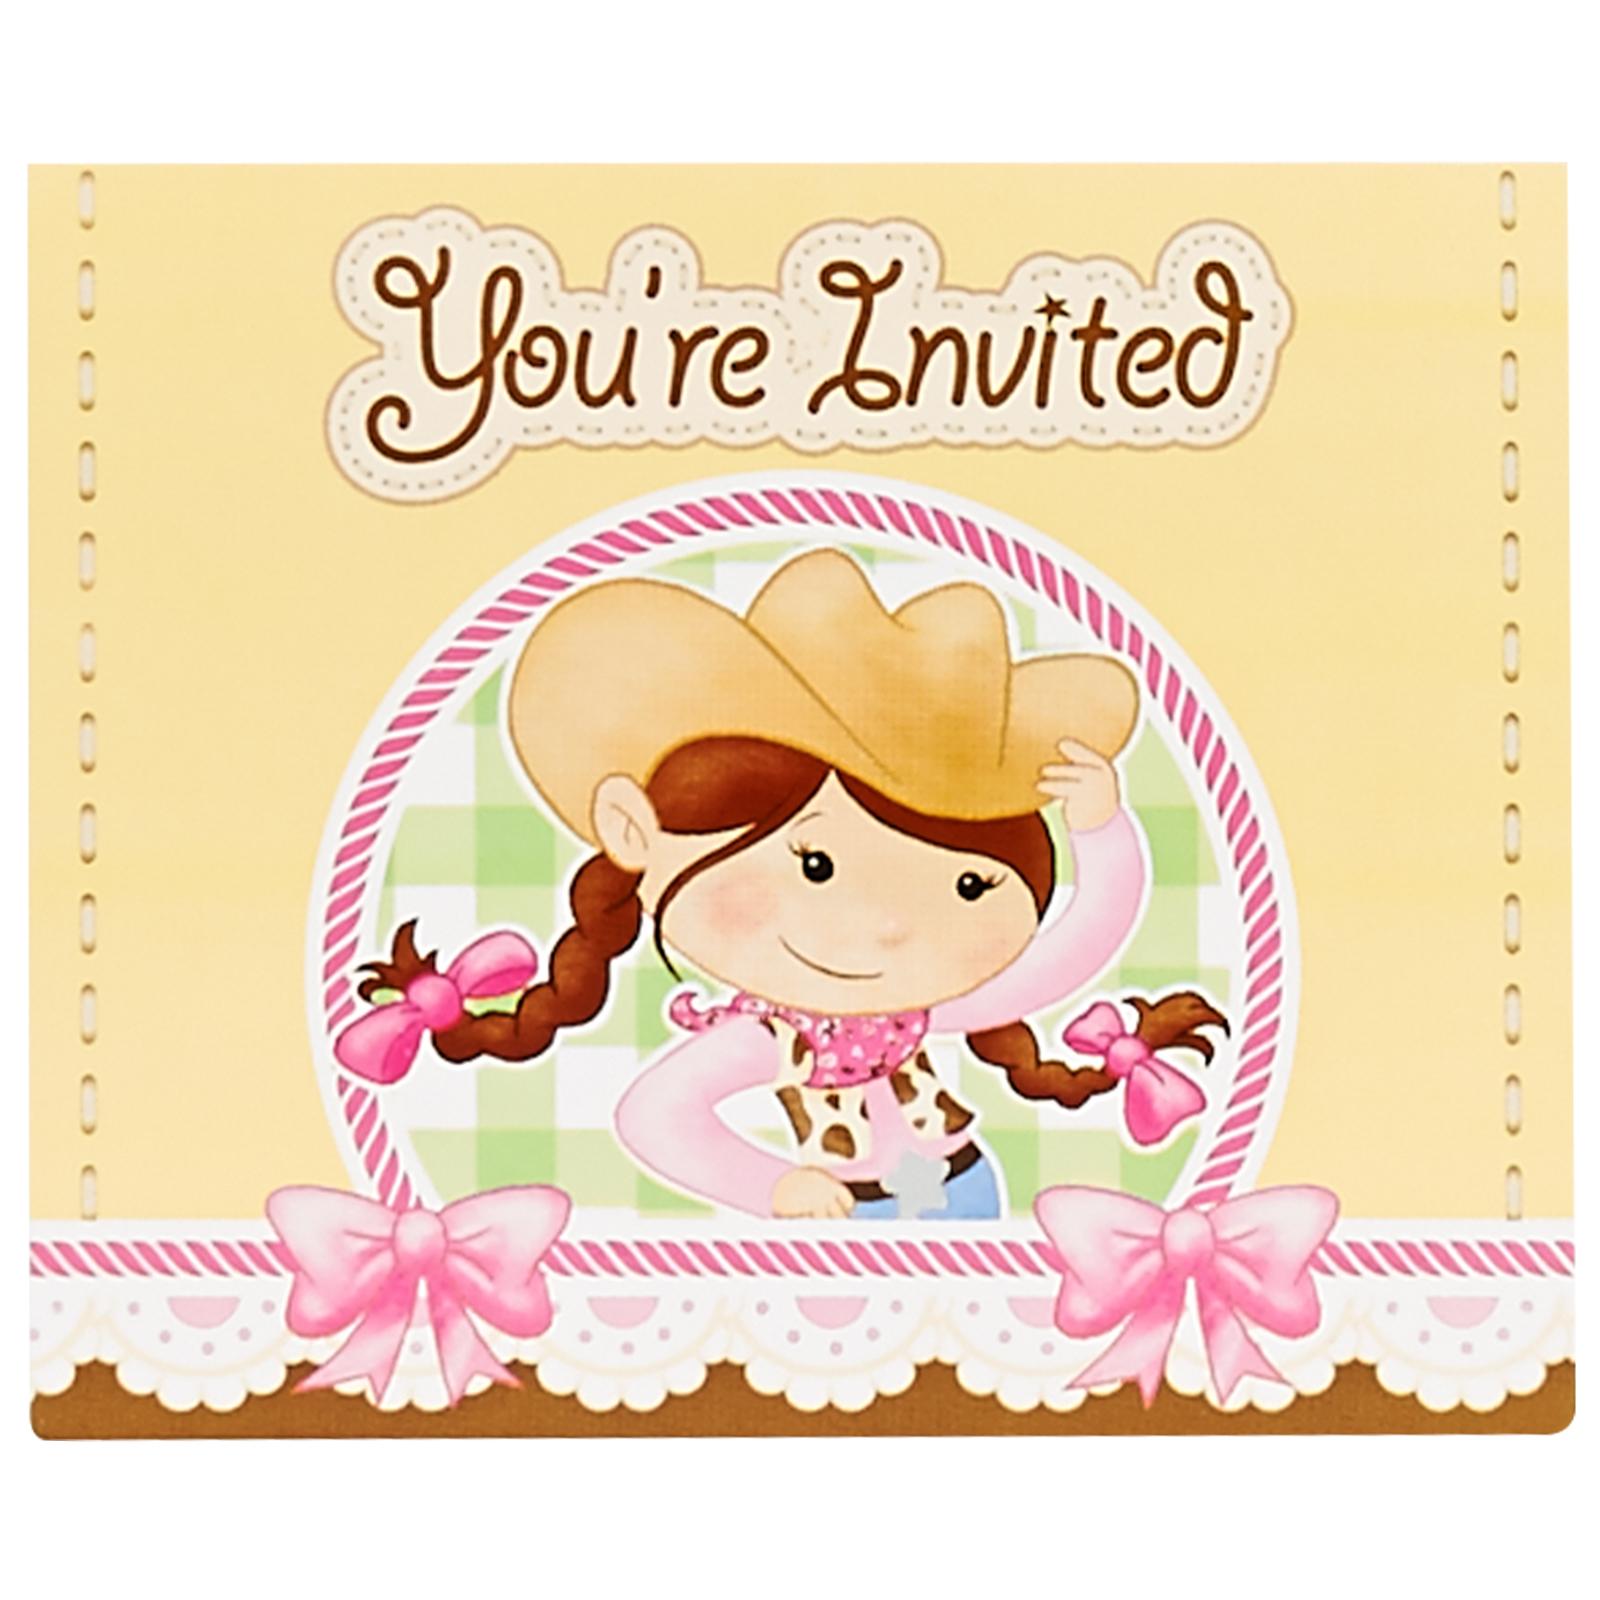 Pink Cowgirl Invitations (8) | BirthdayExpress.com